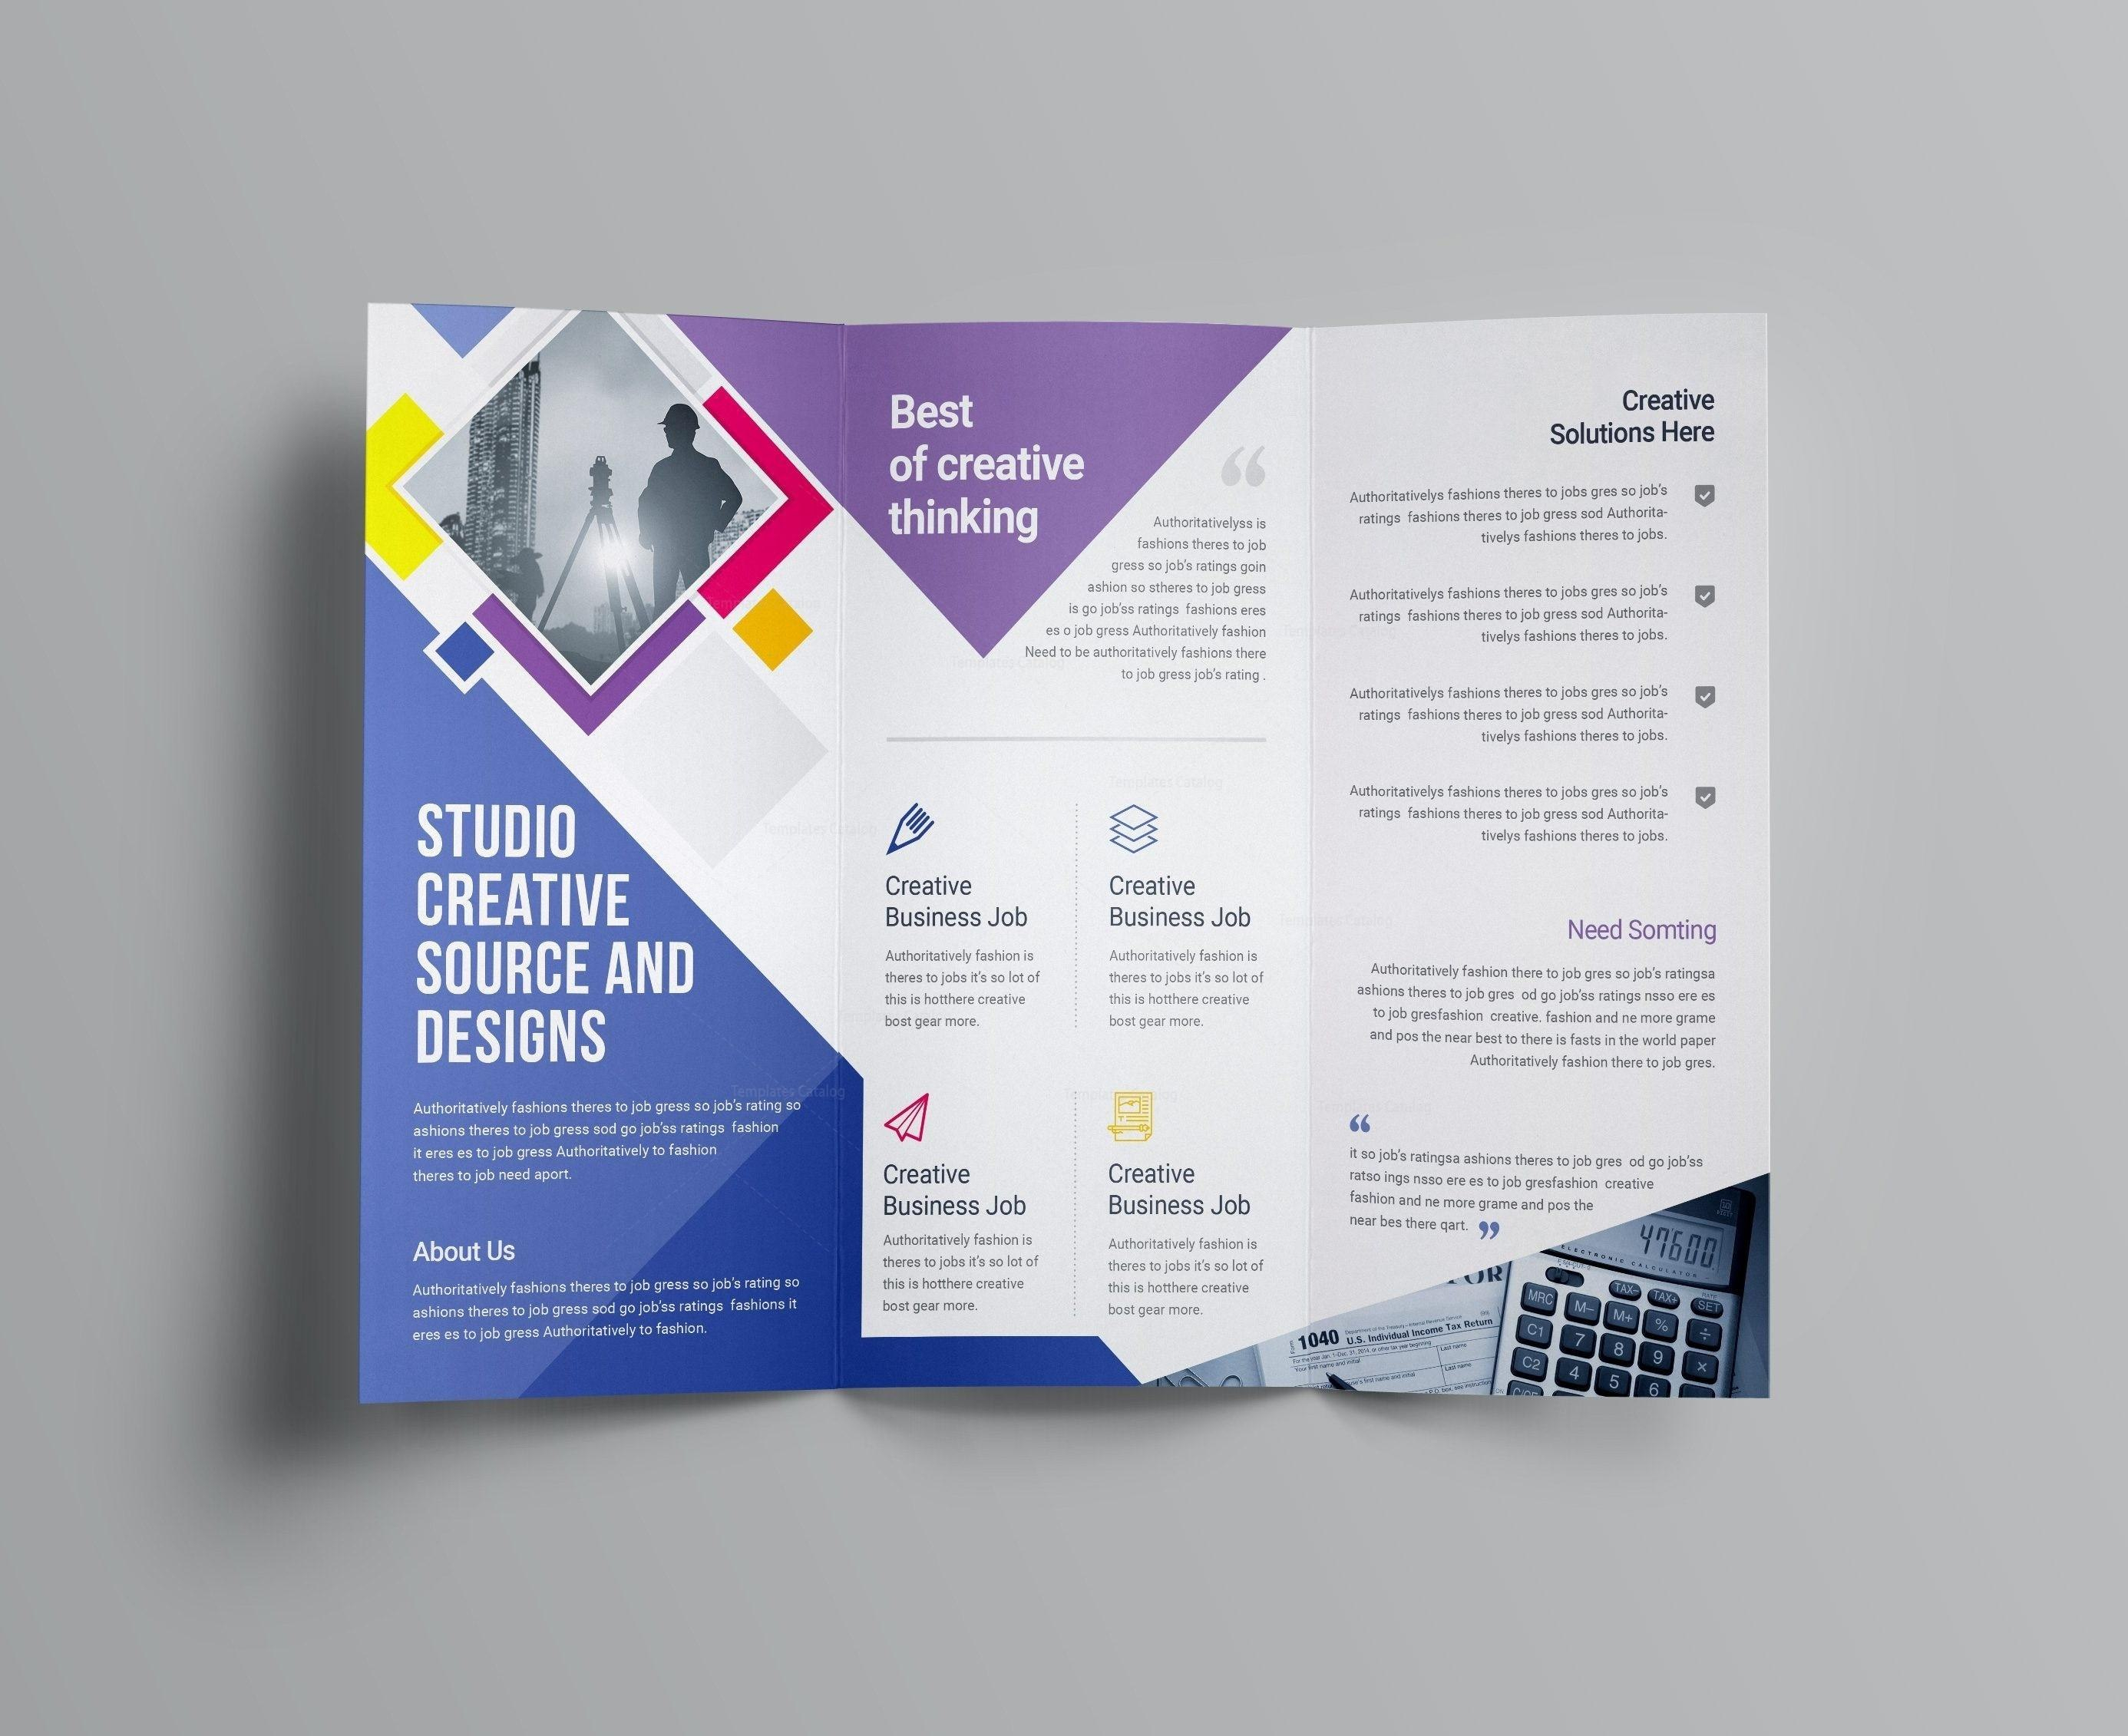 Adobe Indesign Brochure Templates Tips Com In Free Template Throughout Adobe Indesign Brochure Templates